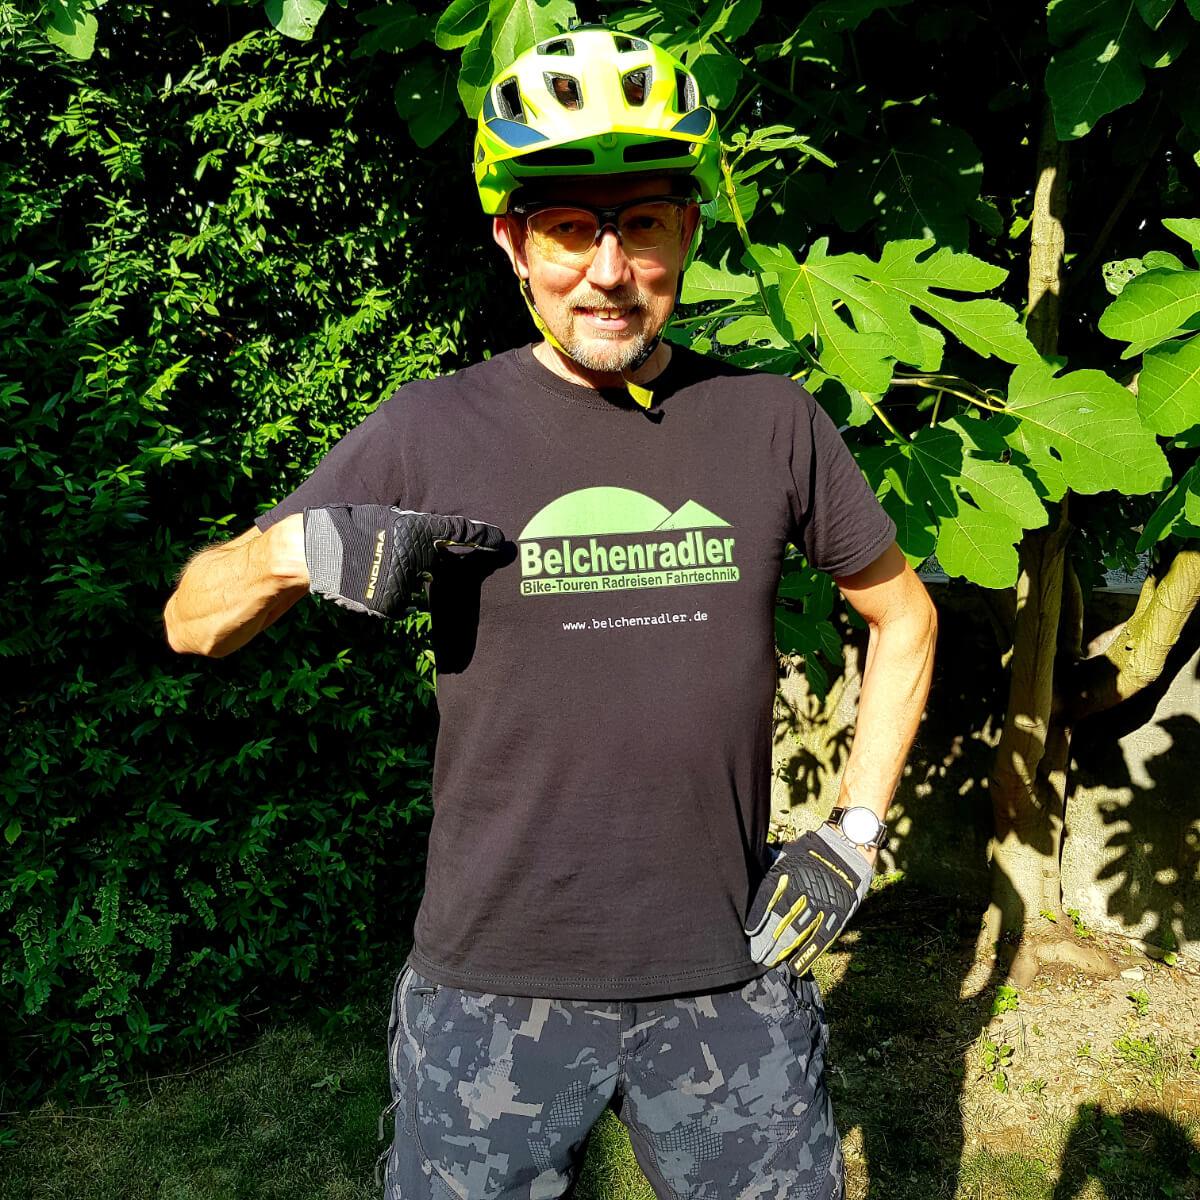 T-Shirt mit Belchenradler Logo